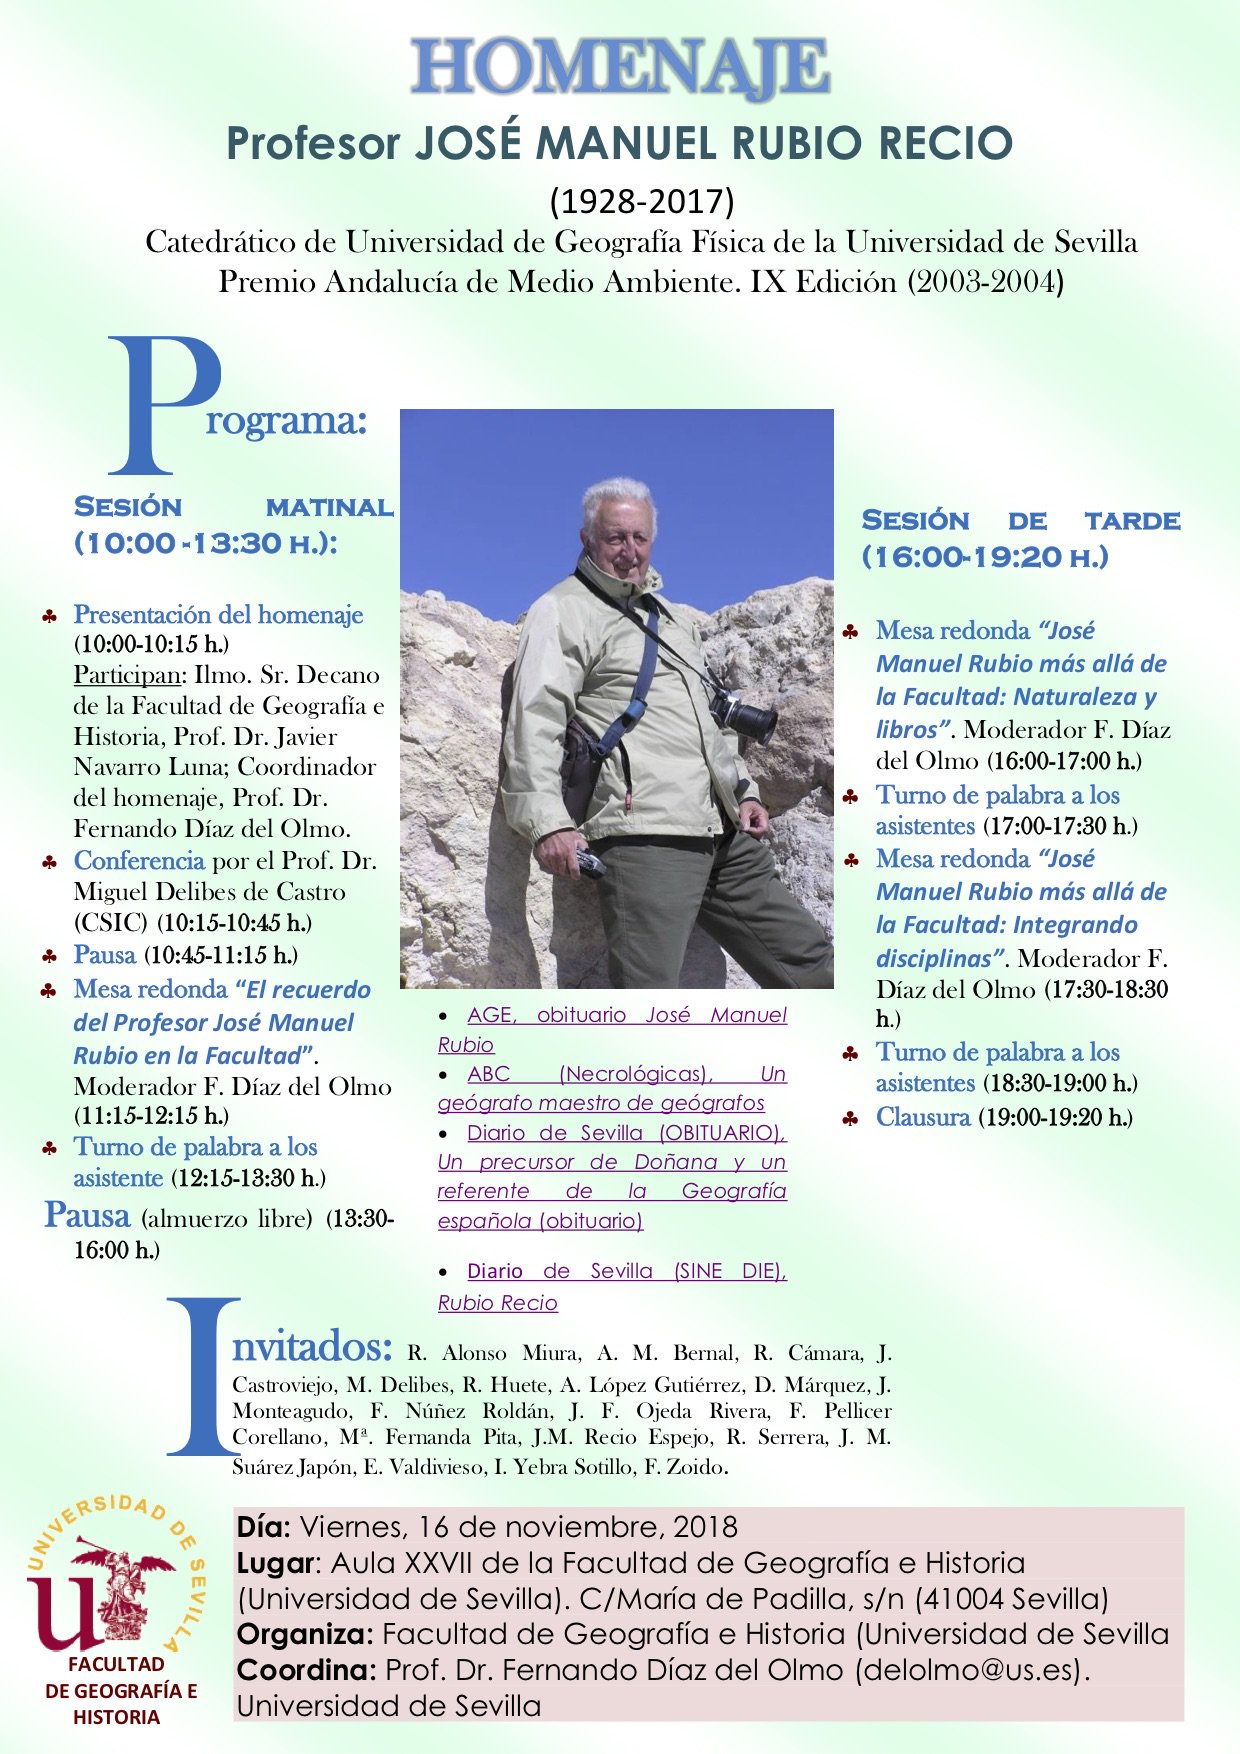 Homenaje Profesor José Manuel Rubio Recio